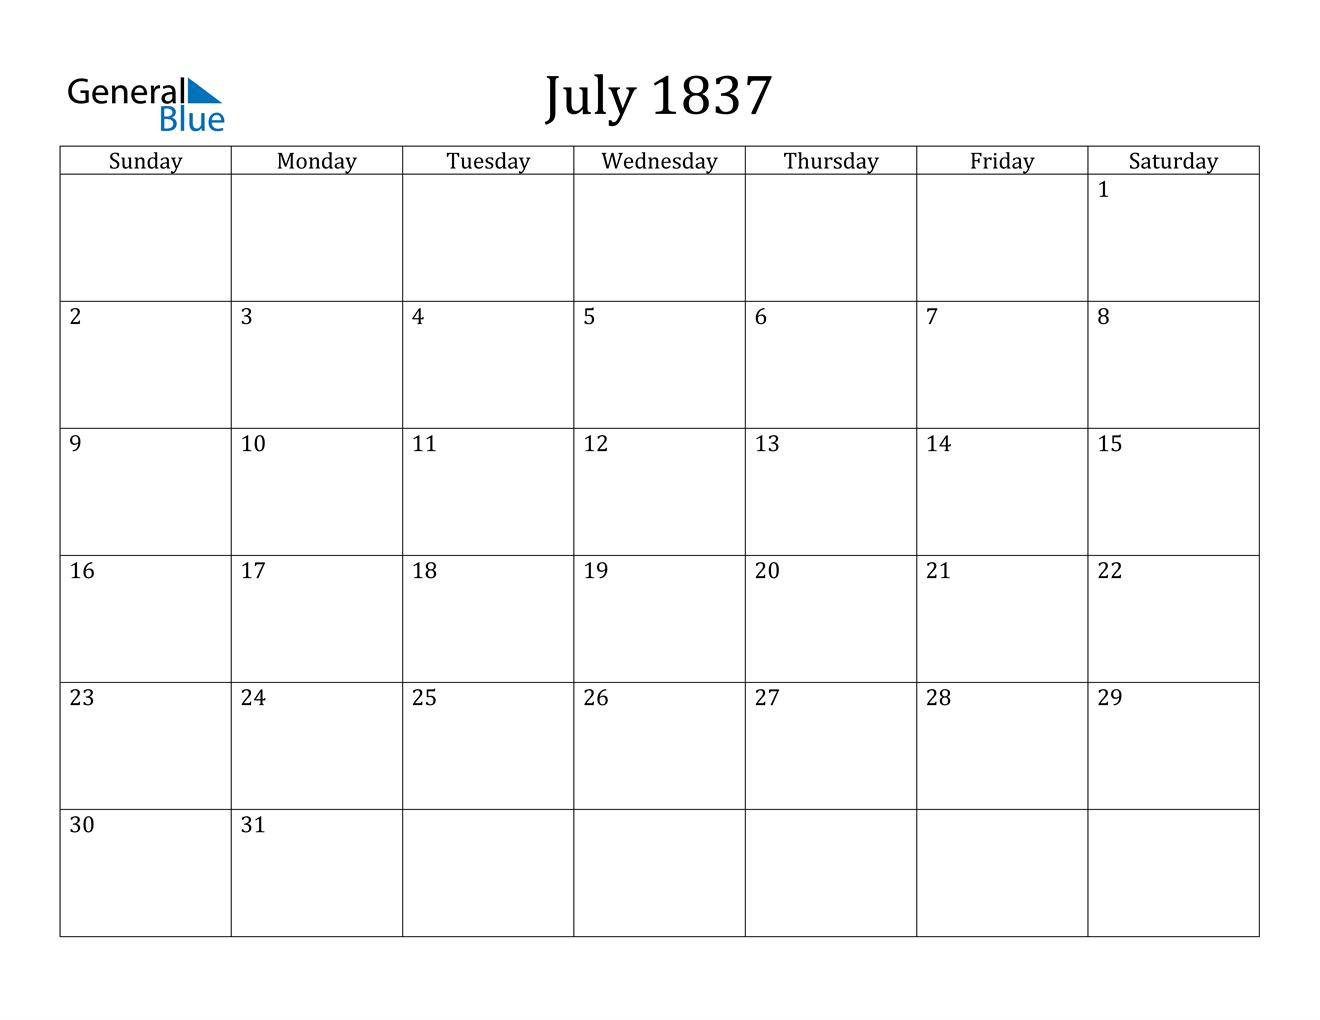 Image of July 1837 Calendar